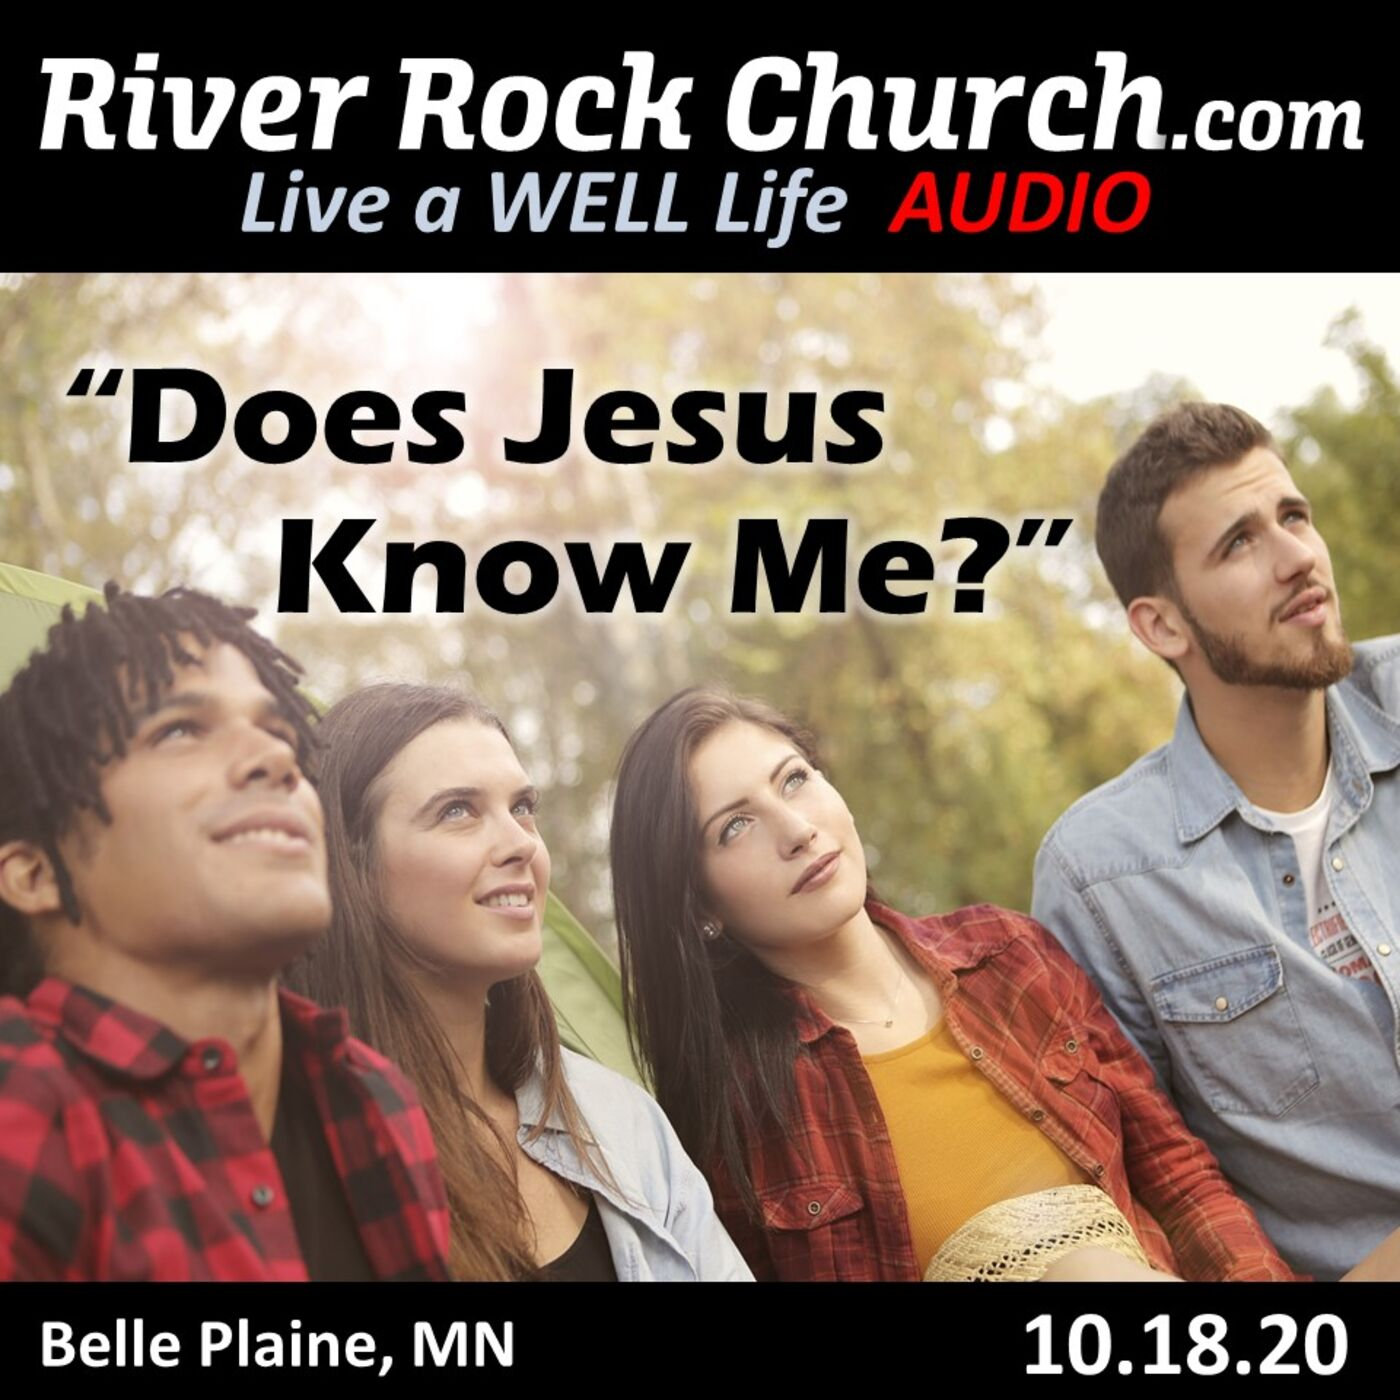 Does Jesus Know Me?